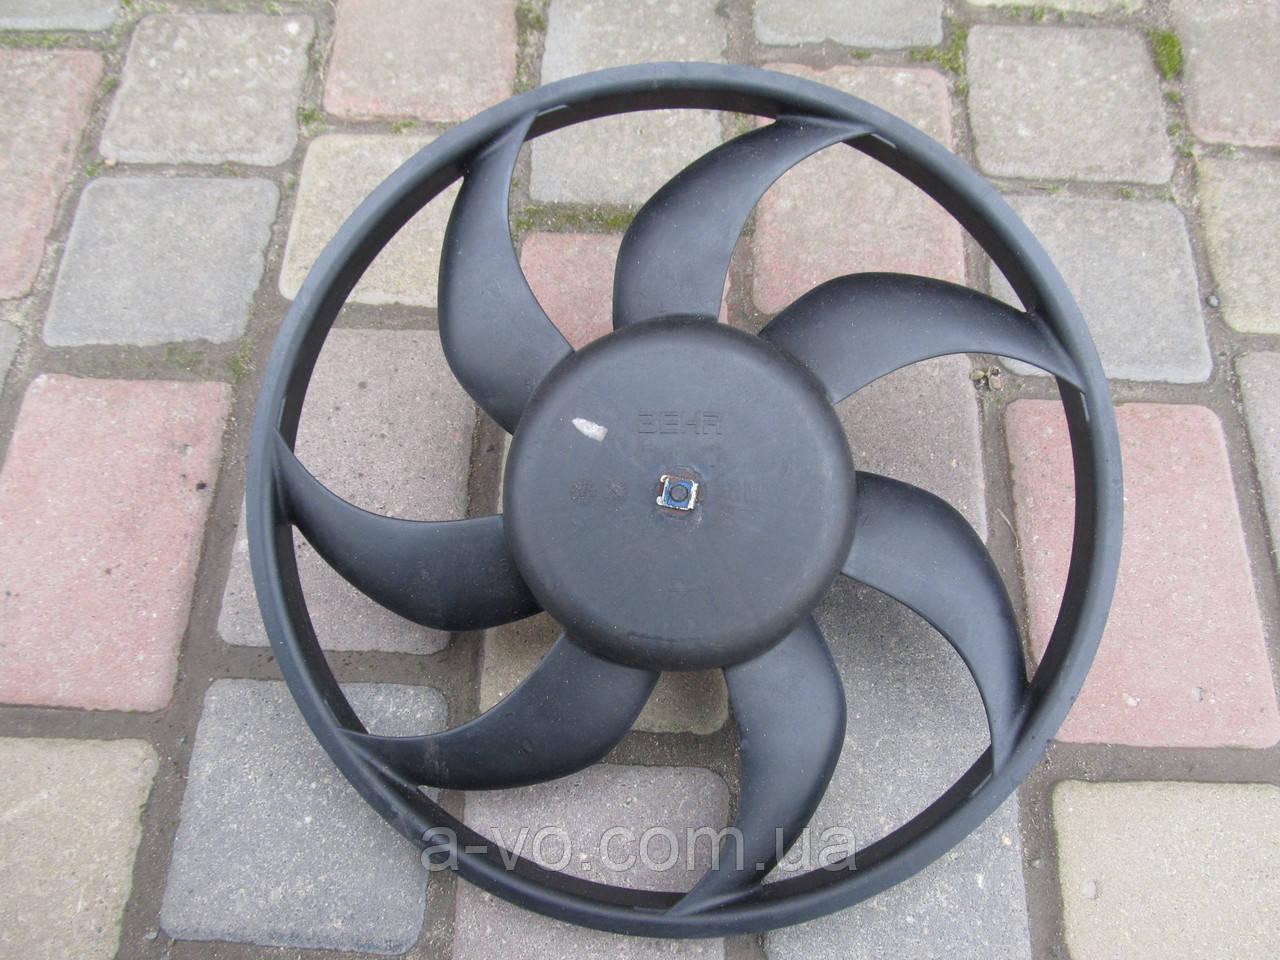 Вентилятор основного радиатора для Opel Corsa C 1.2B 24.445.190, 24445190